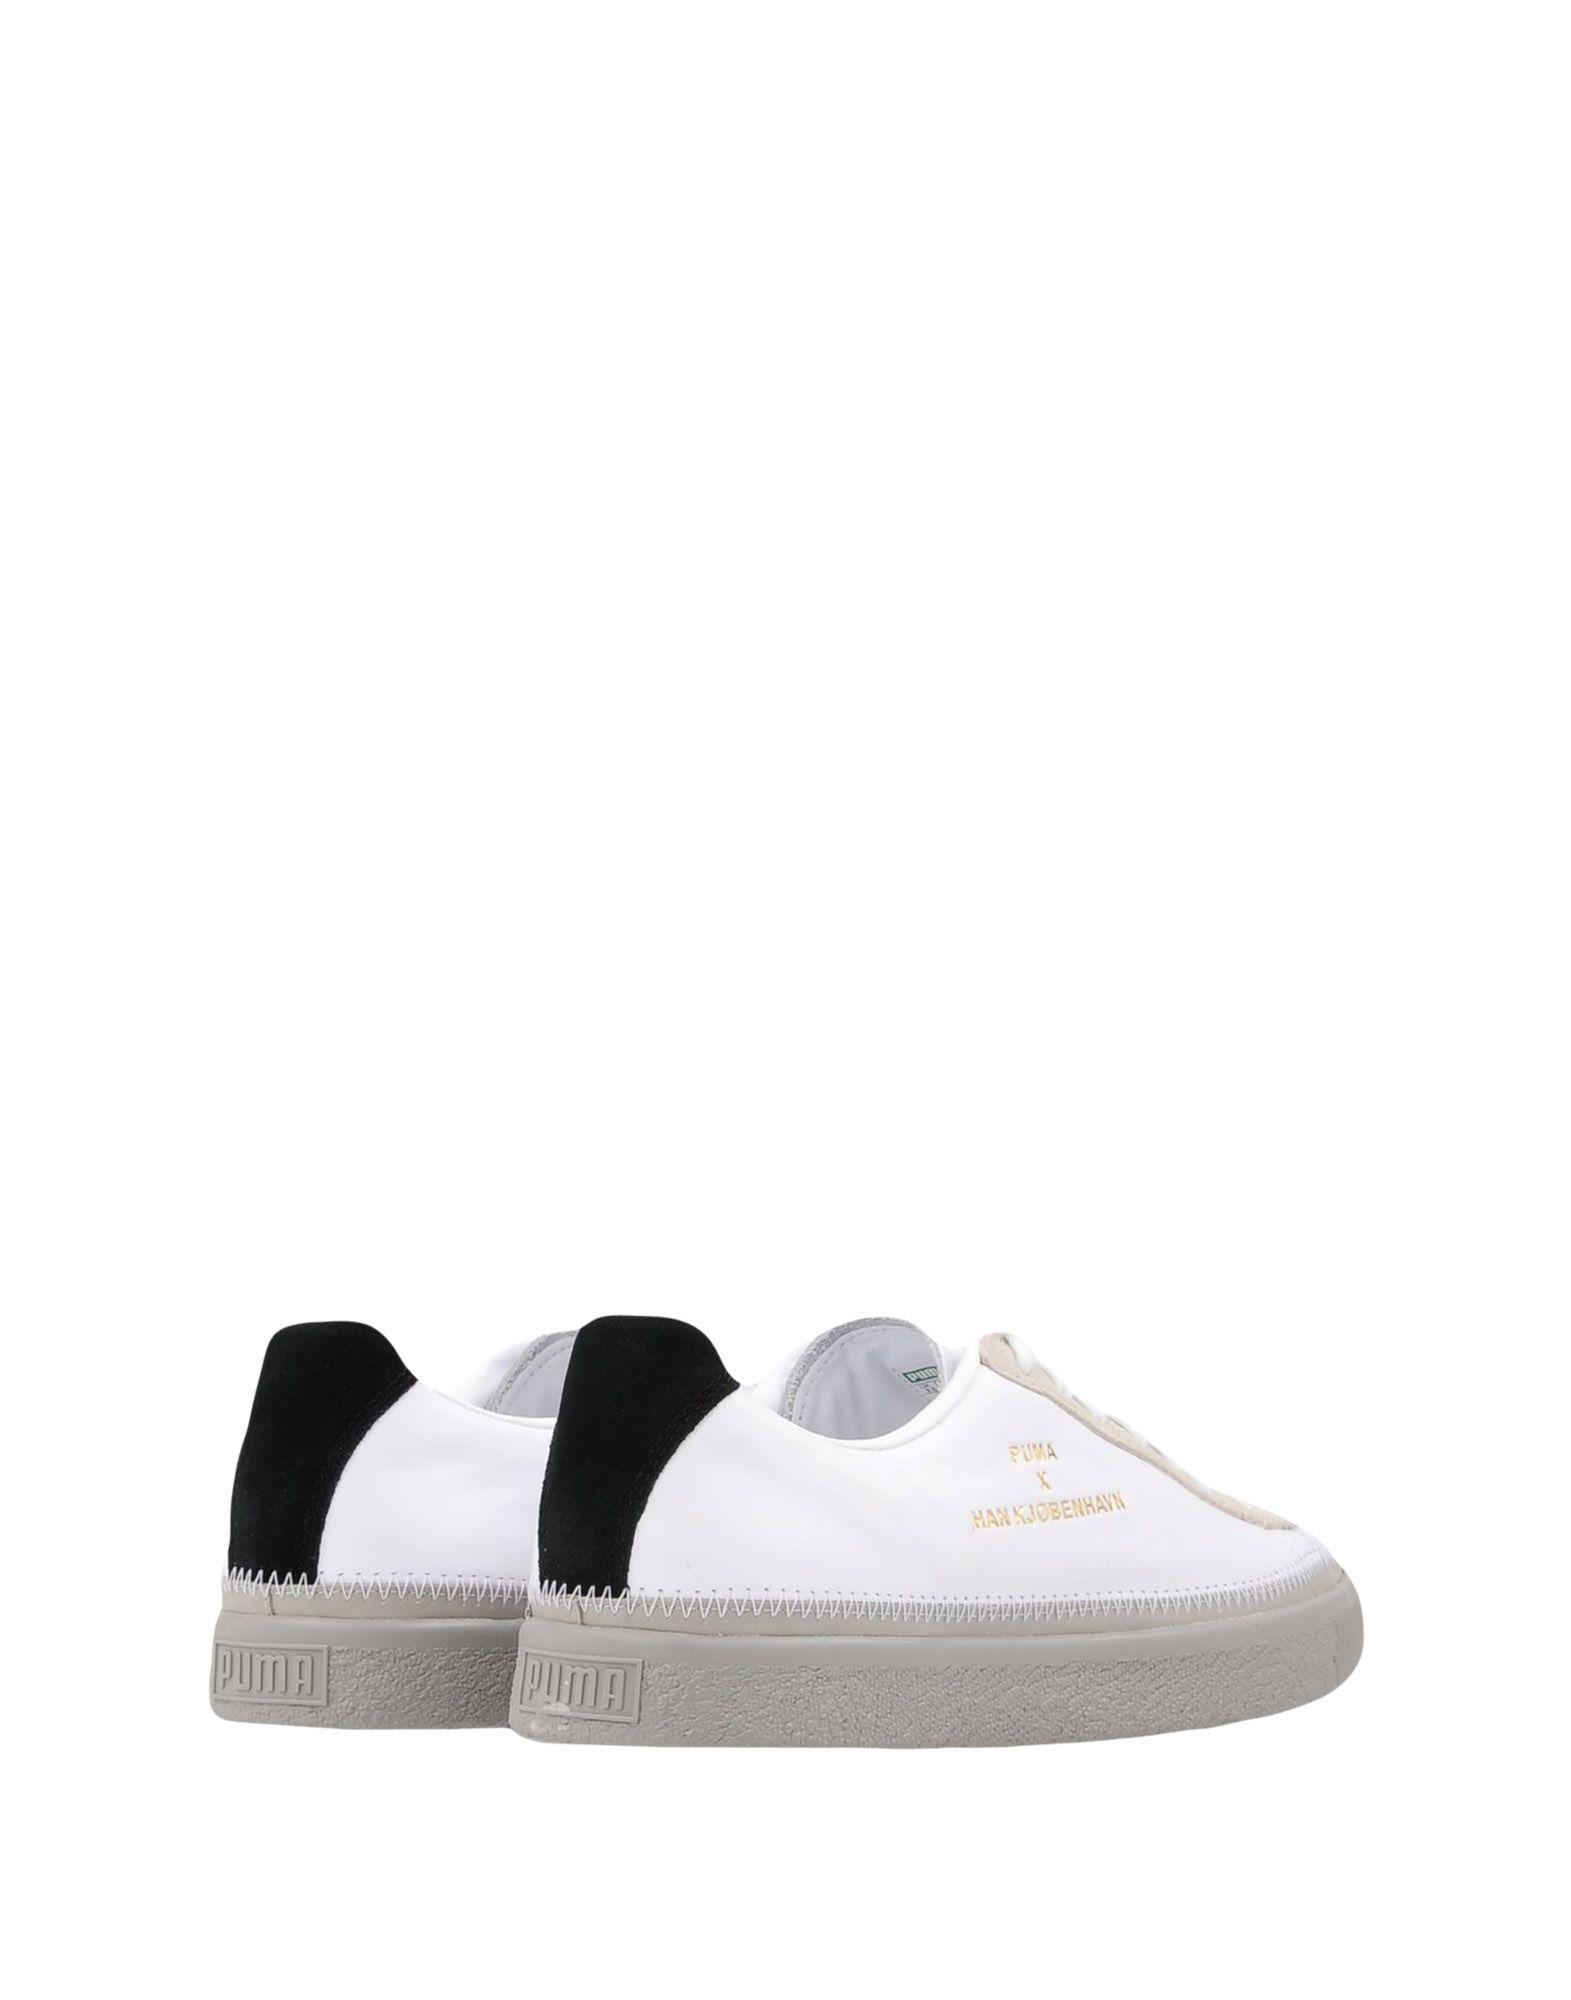 Rabatt Schuhe echte Schuhe Rabatt Puma X Han Kjøbenhavn  Basket  11379830EX 3bd4ba